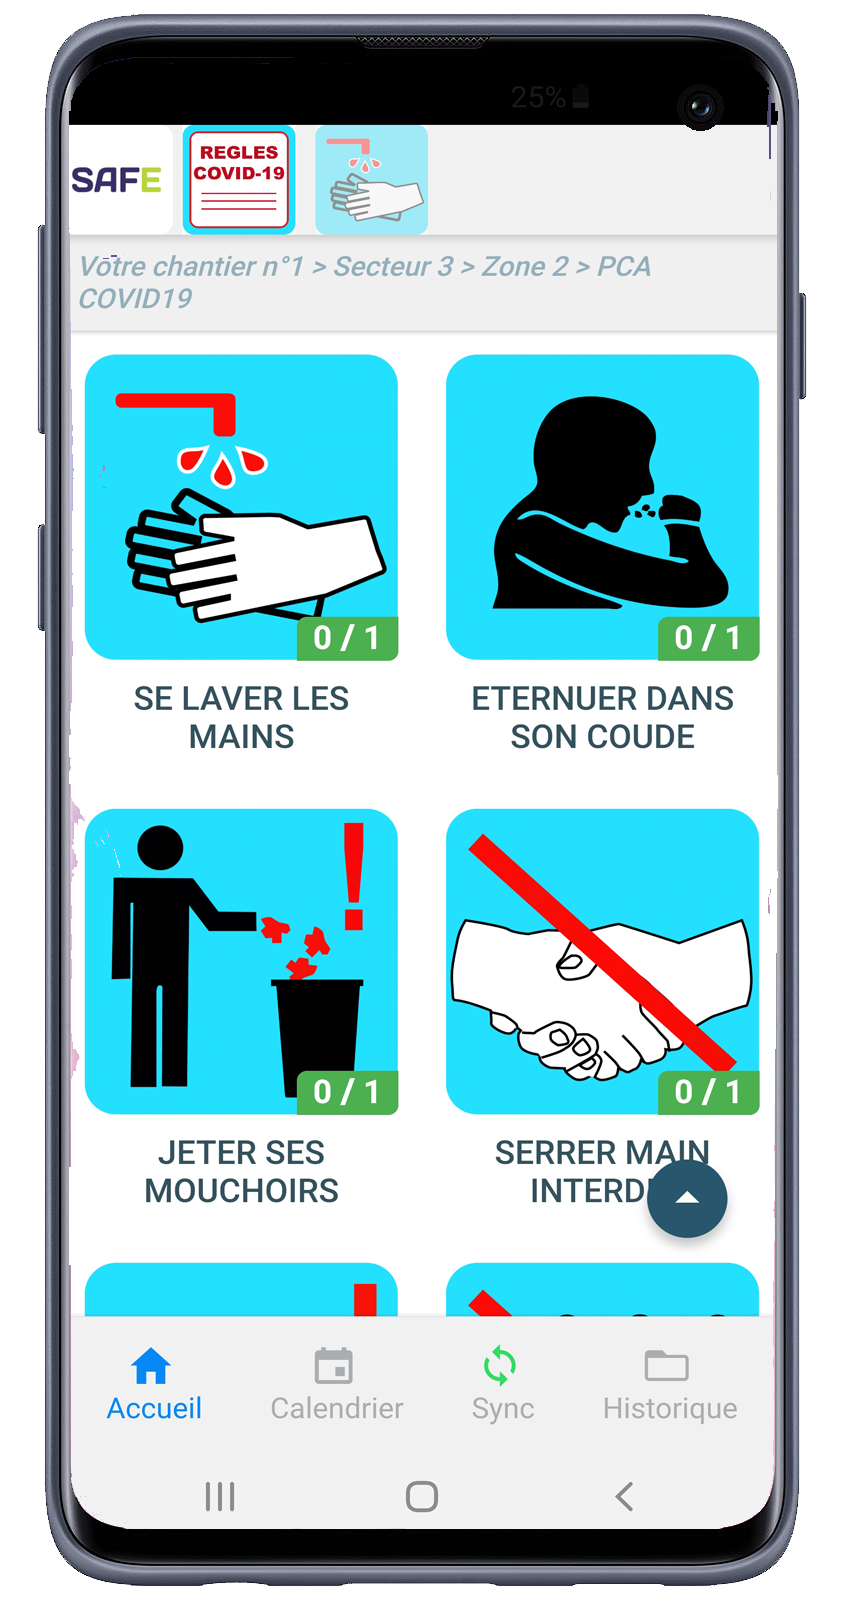 SAFENERGY Mobile App pca visual